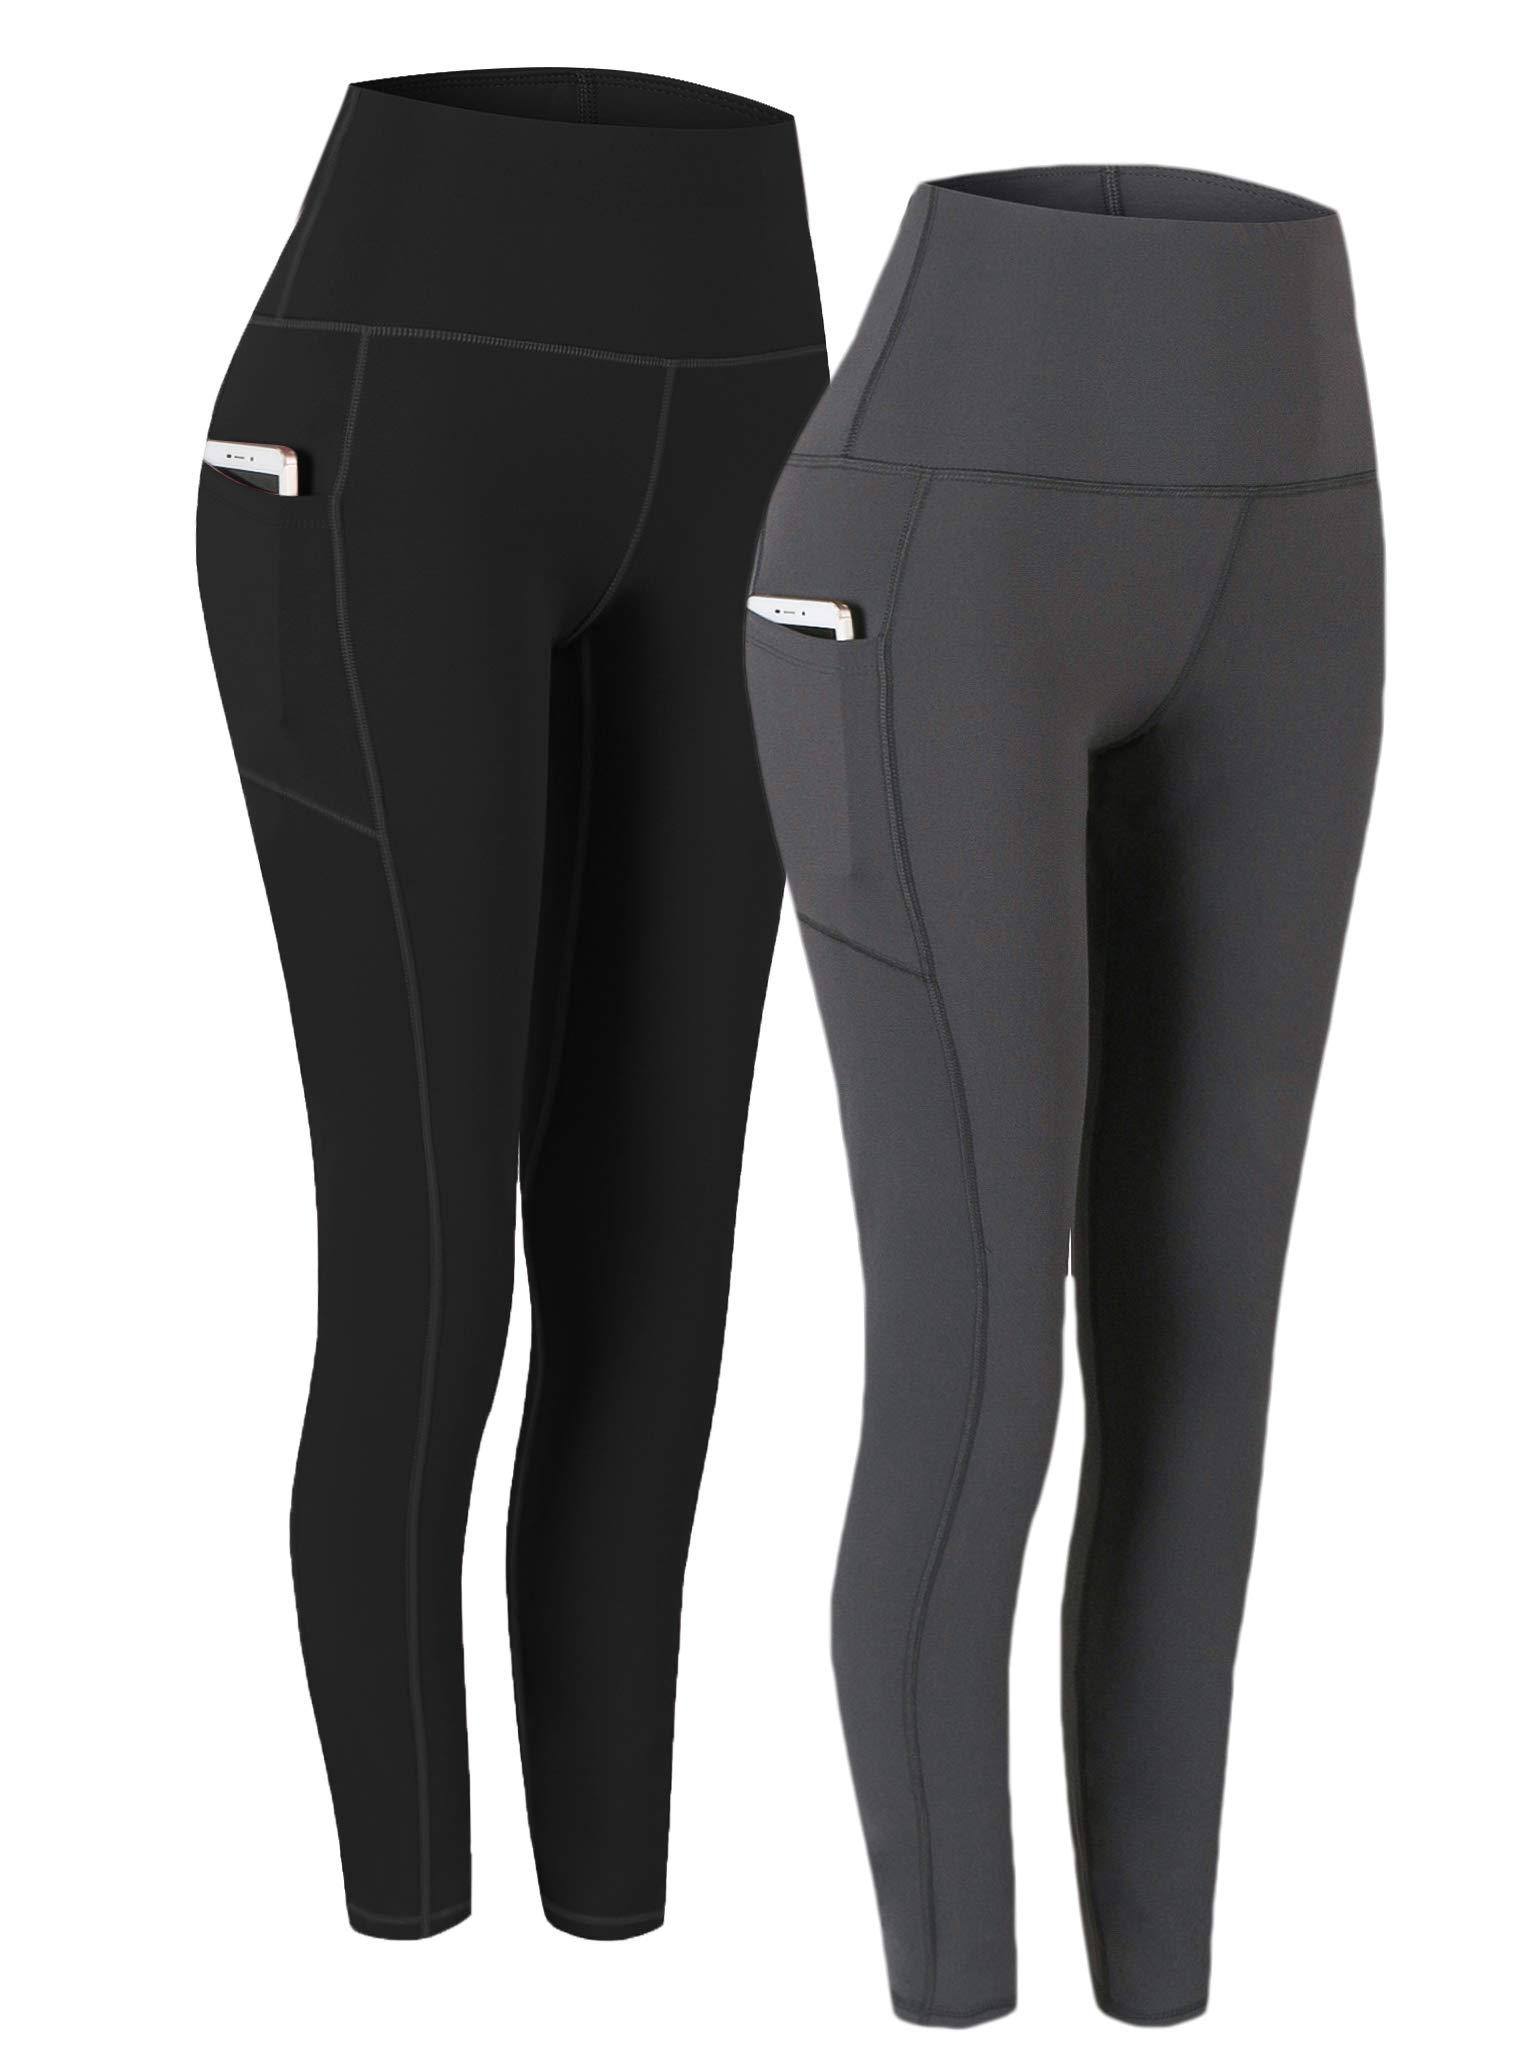 amazon fitness pants